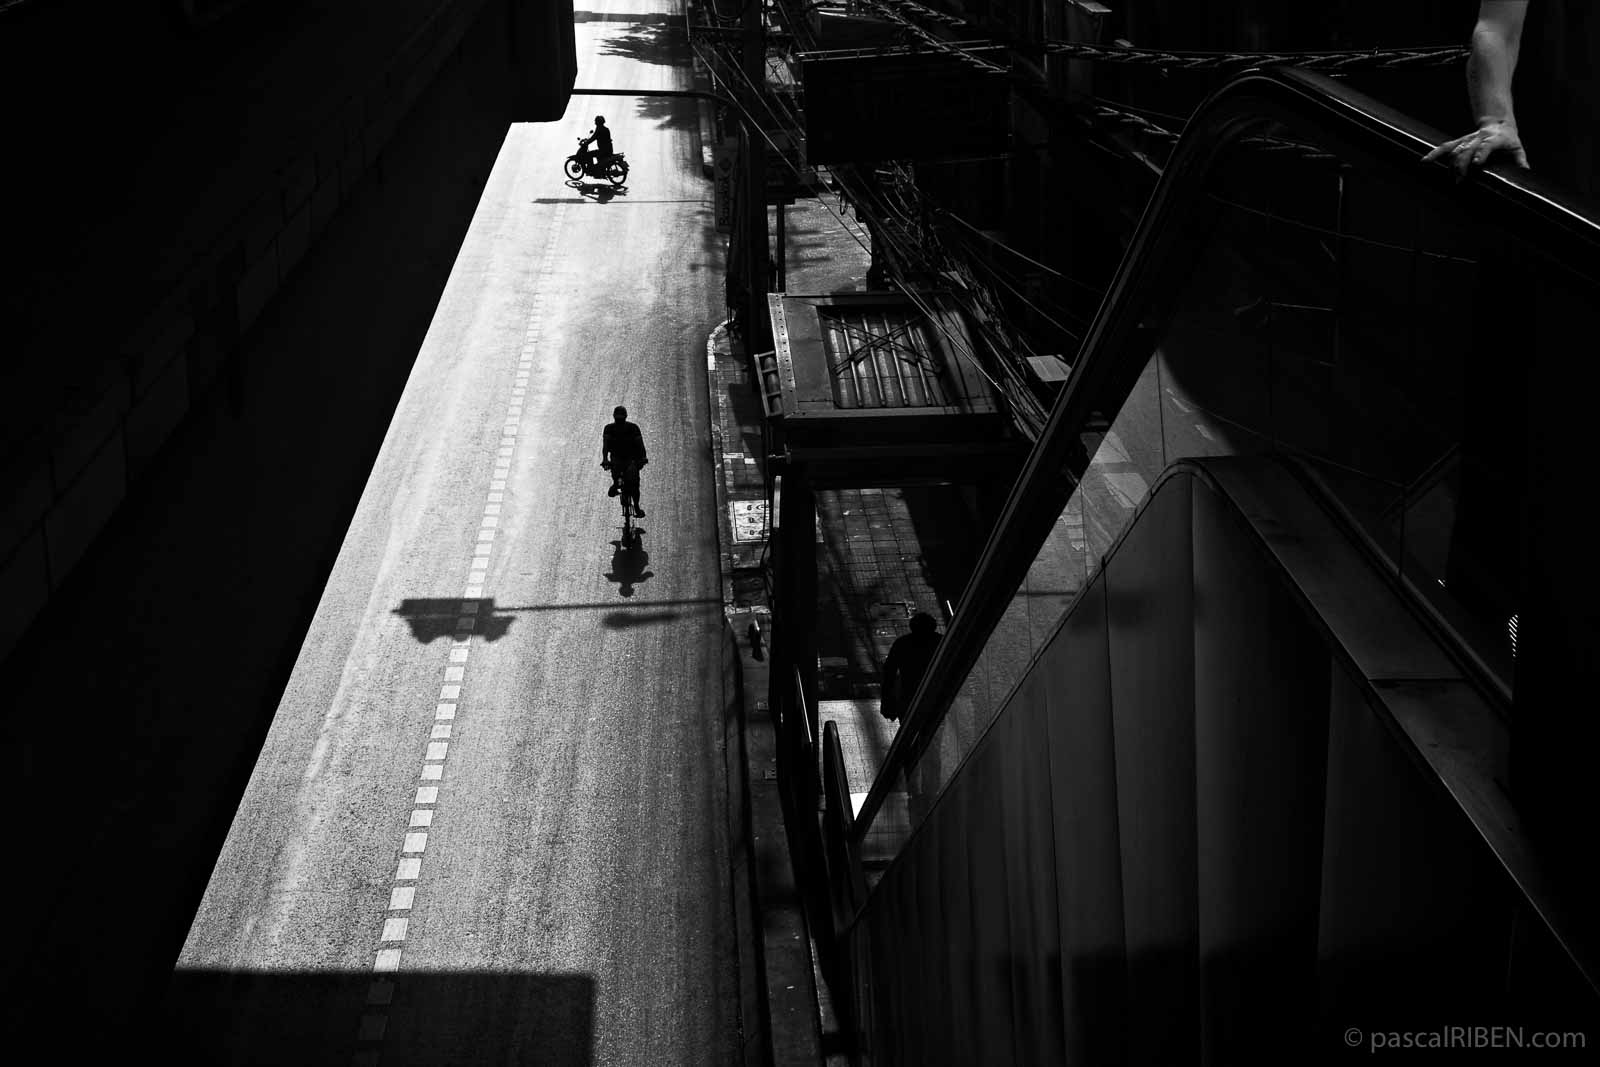 Sukhumvit Road, Bangkok, Thailand - BTS, Nana Station - Canon EOS 400D, Canon 35mm f/2